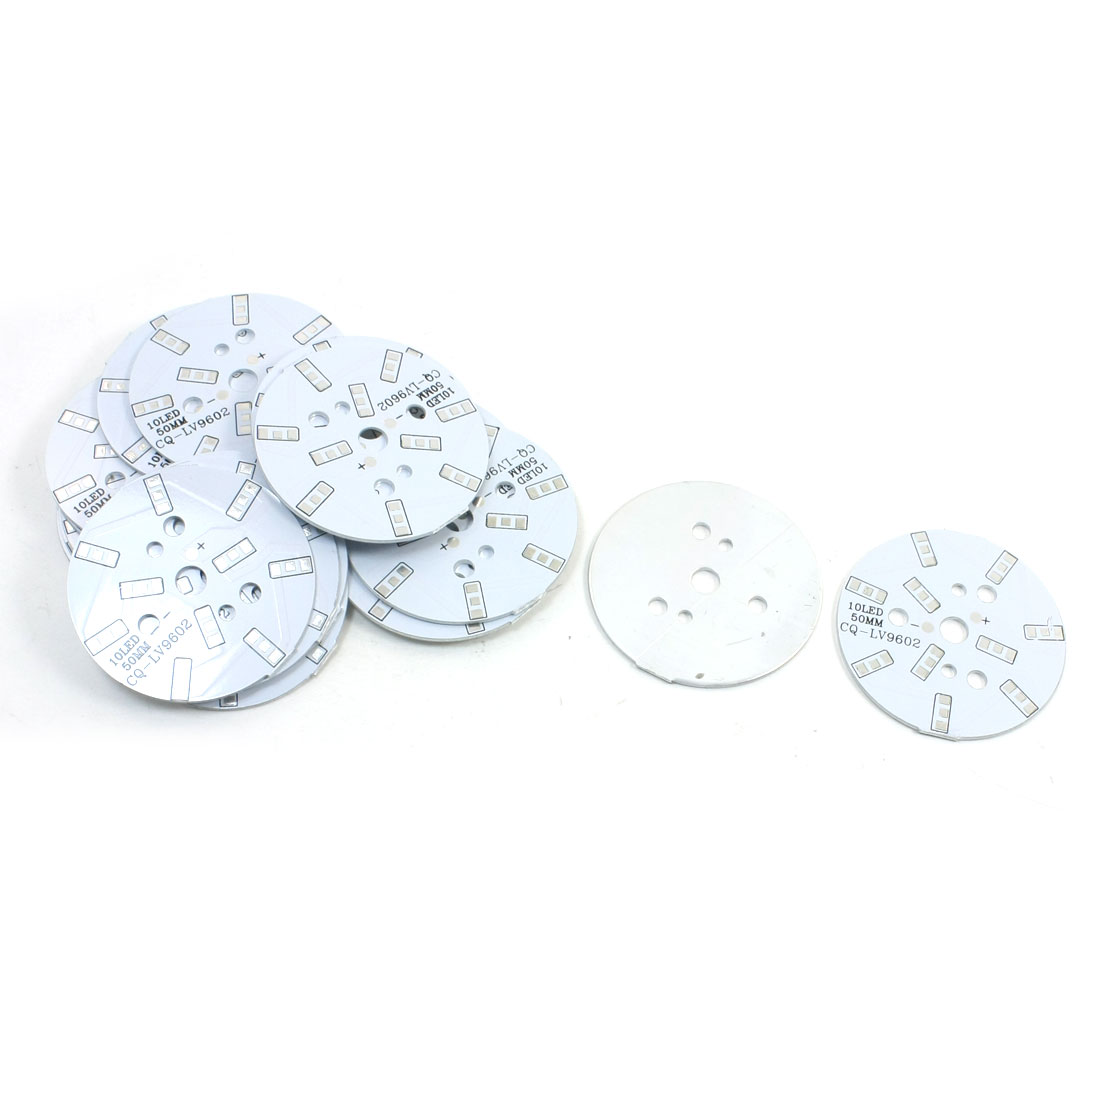 20Pcs 10 x 1/2W 5730 SMD LED High Power DIY Circle Aluminum PCB Circuit Board 50mm Diameter